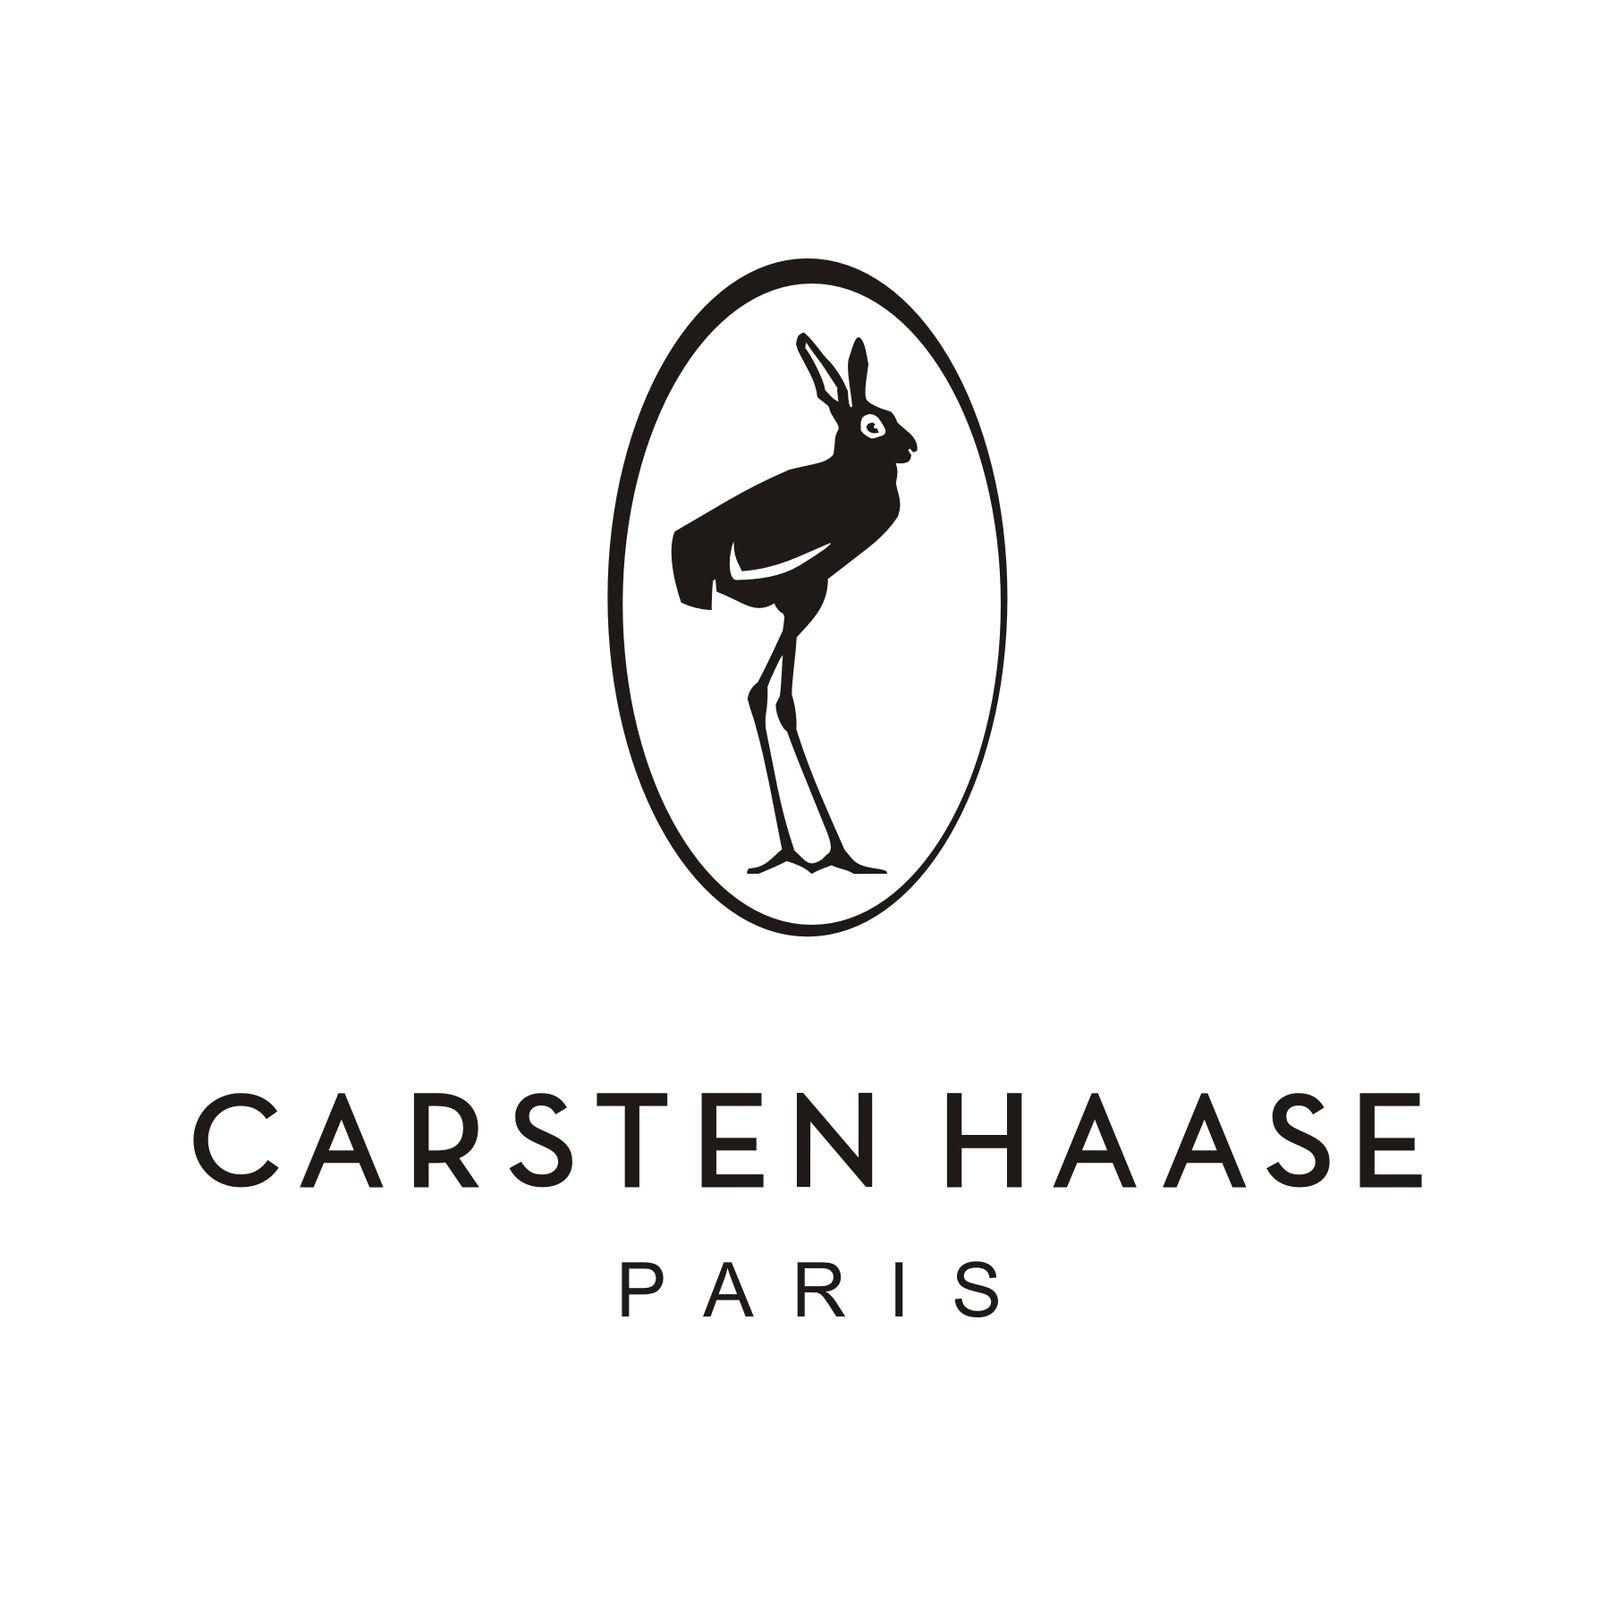 CARSTEN HAASE